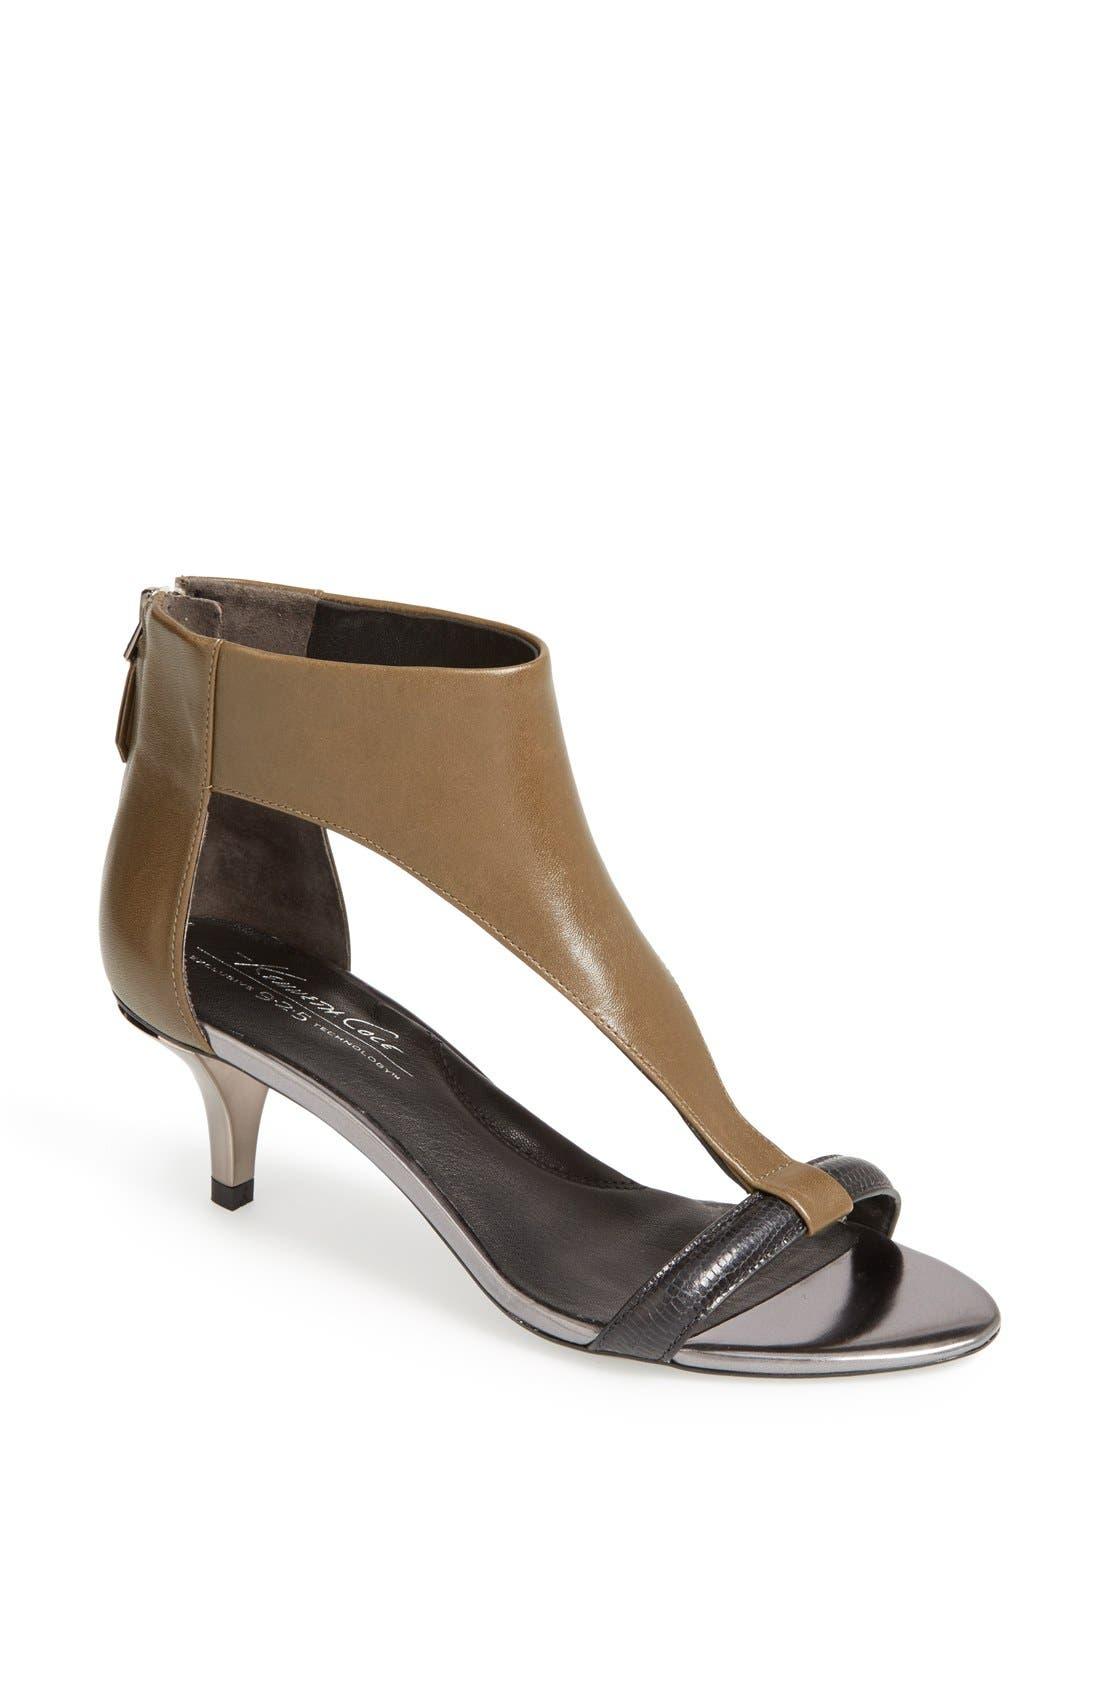 Main Image - Kenneth Cole New York 'Havemeyer' Leather Sandal